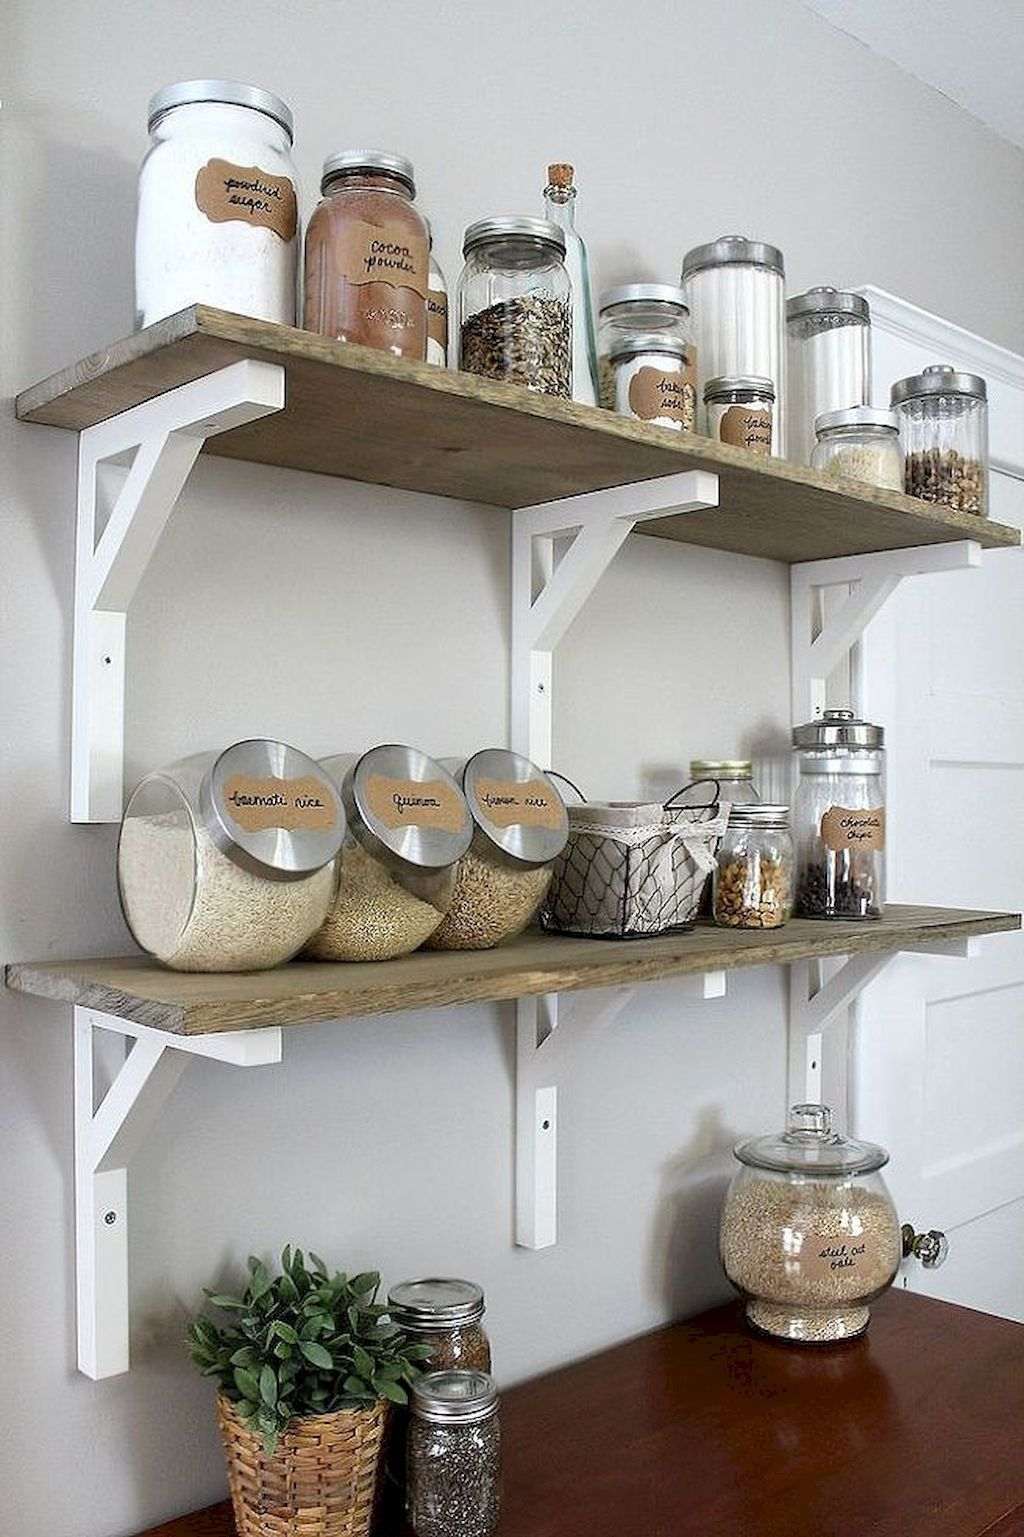 40 space saving storage and oragnization for small kitchens ideas remodel diy kitchen storage on kitchen organization for small spaces id=21889